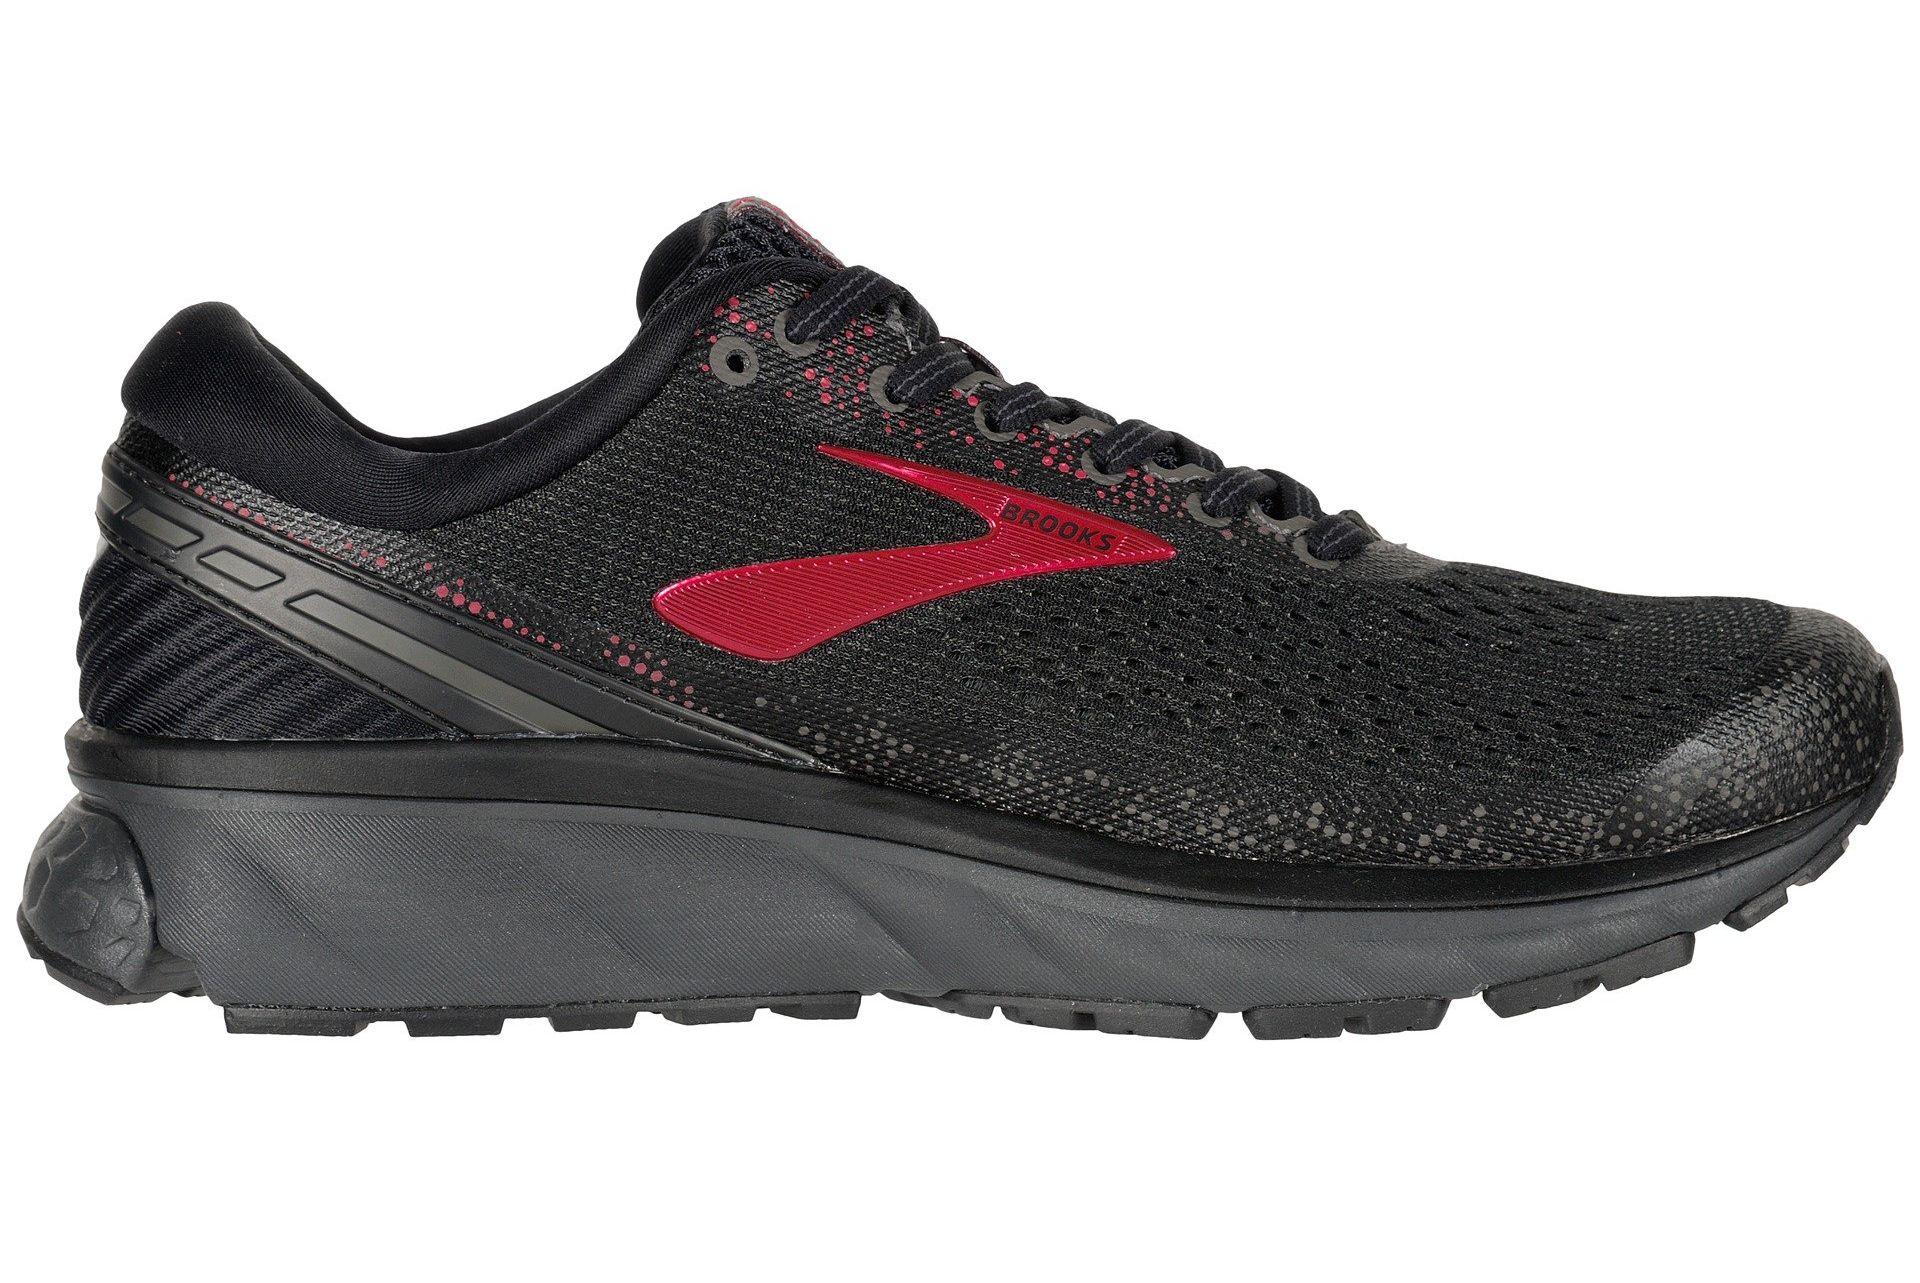 414f062c050 Best Winter Running Shoes